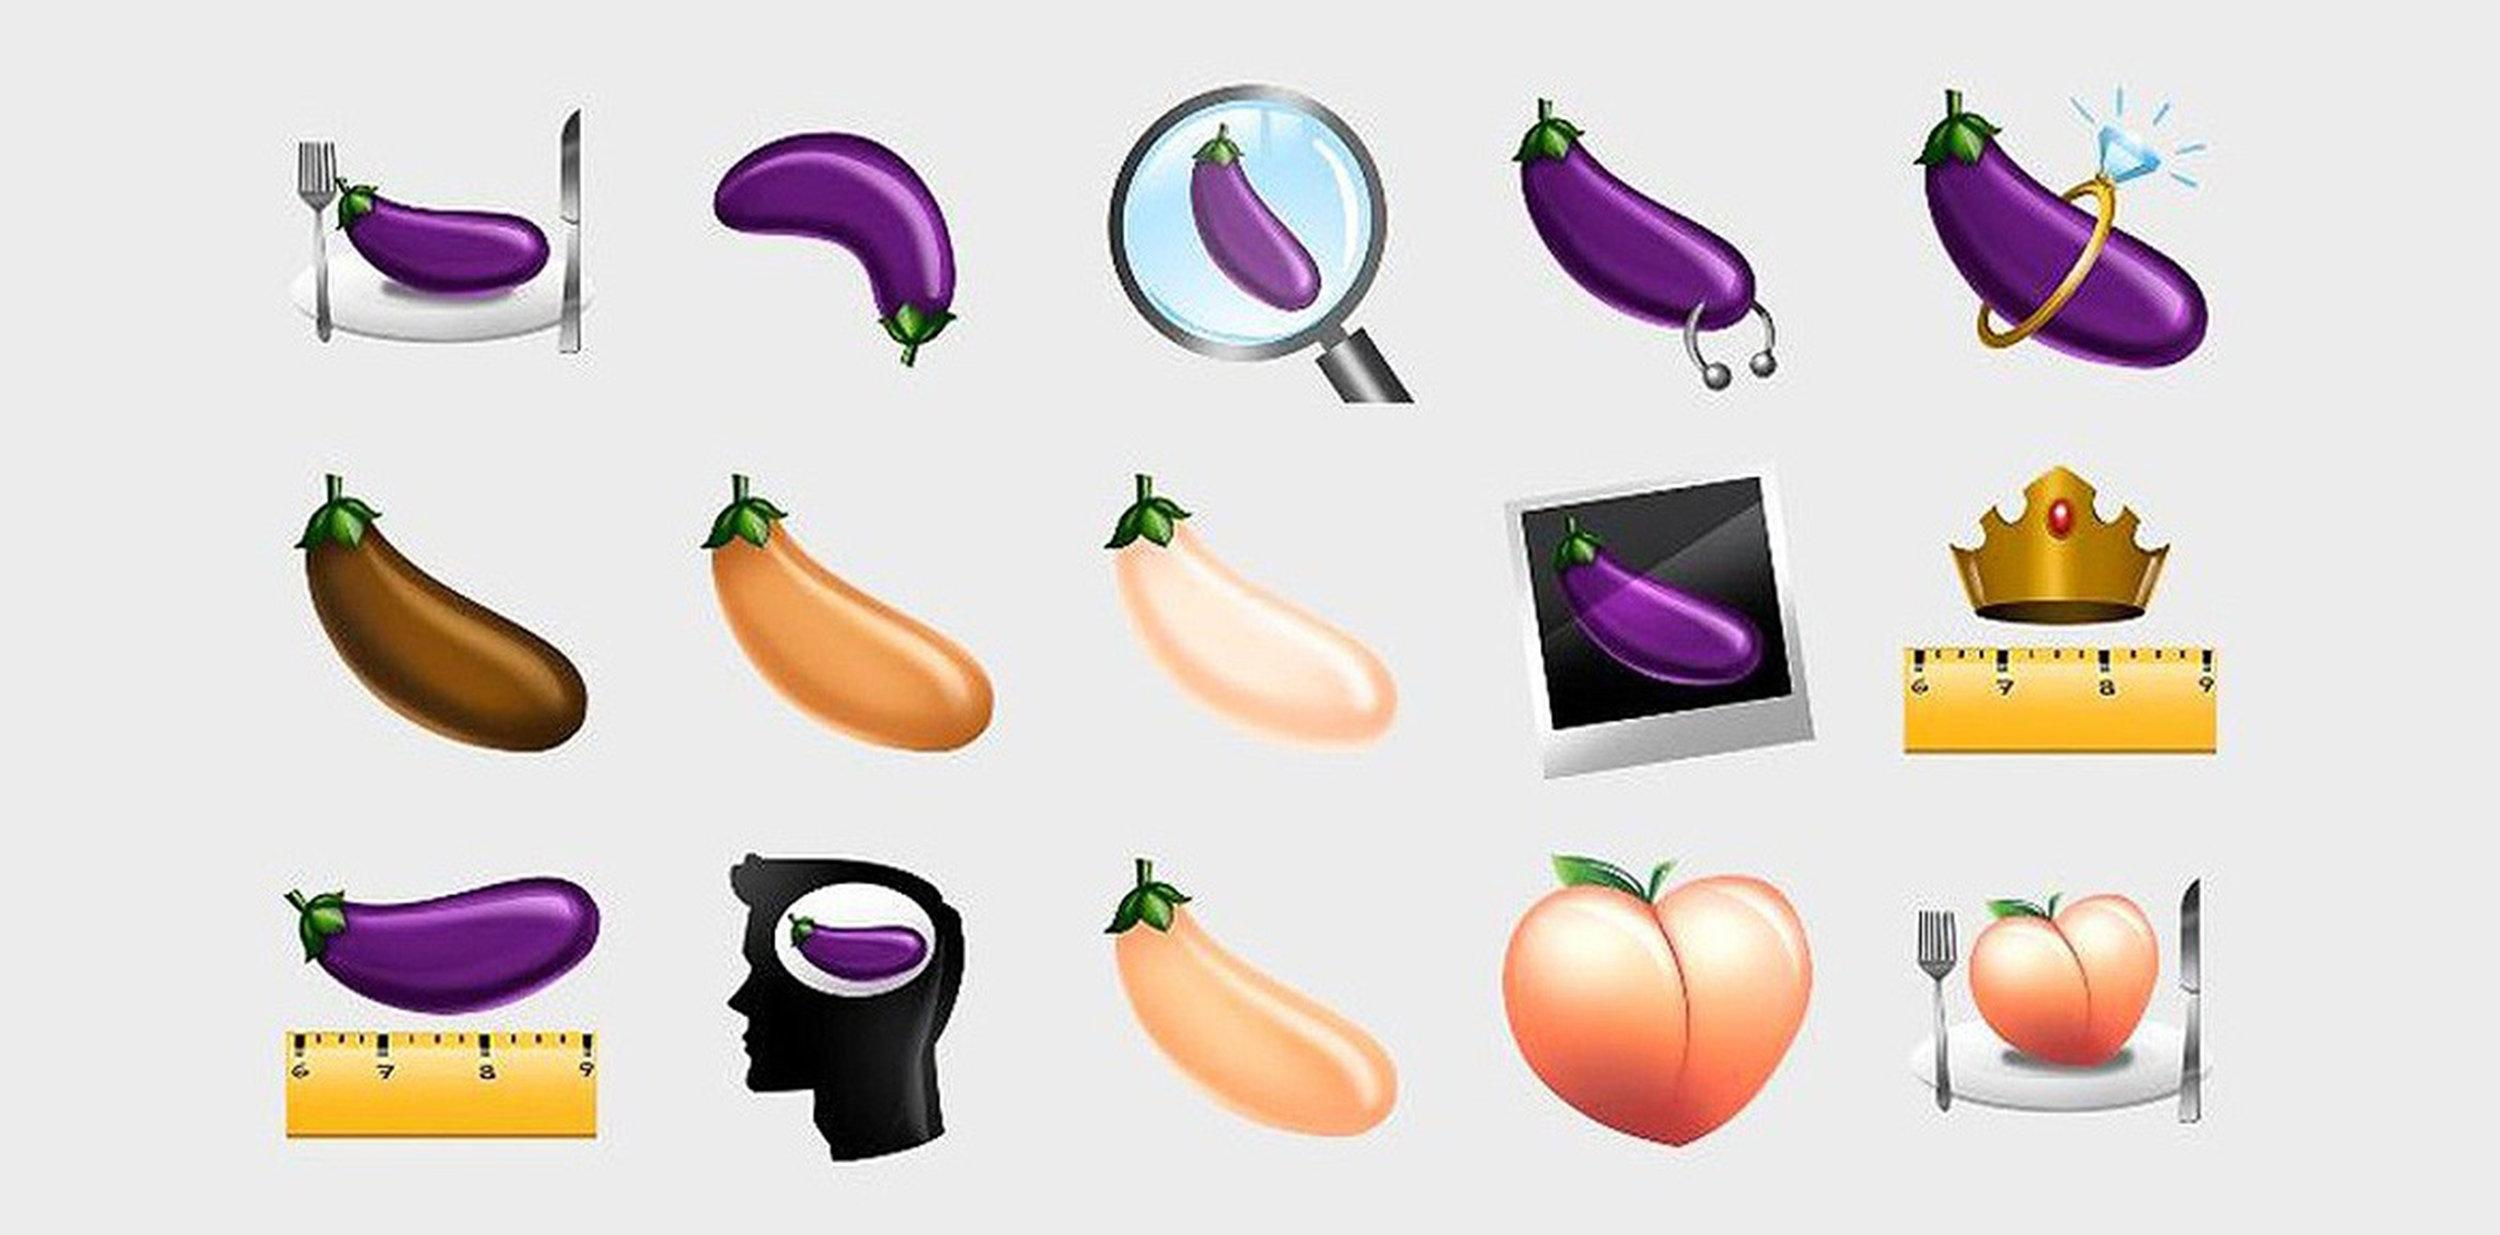 Gaymoji_Eggplants.jpg